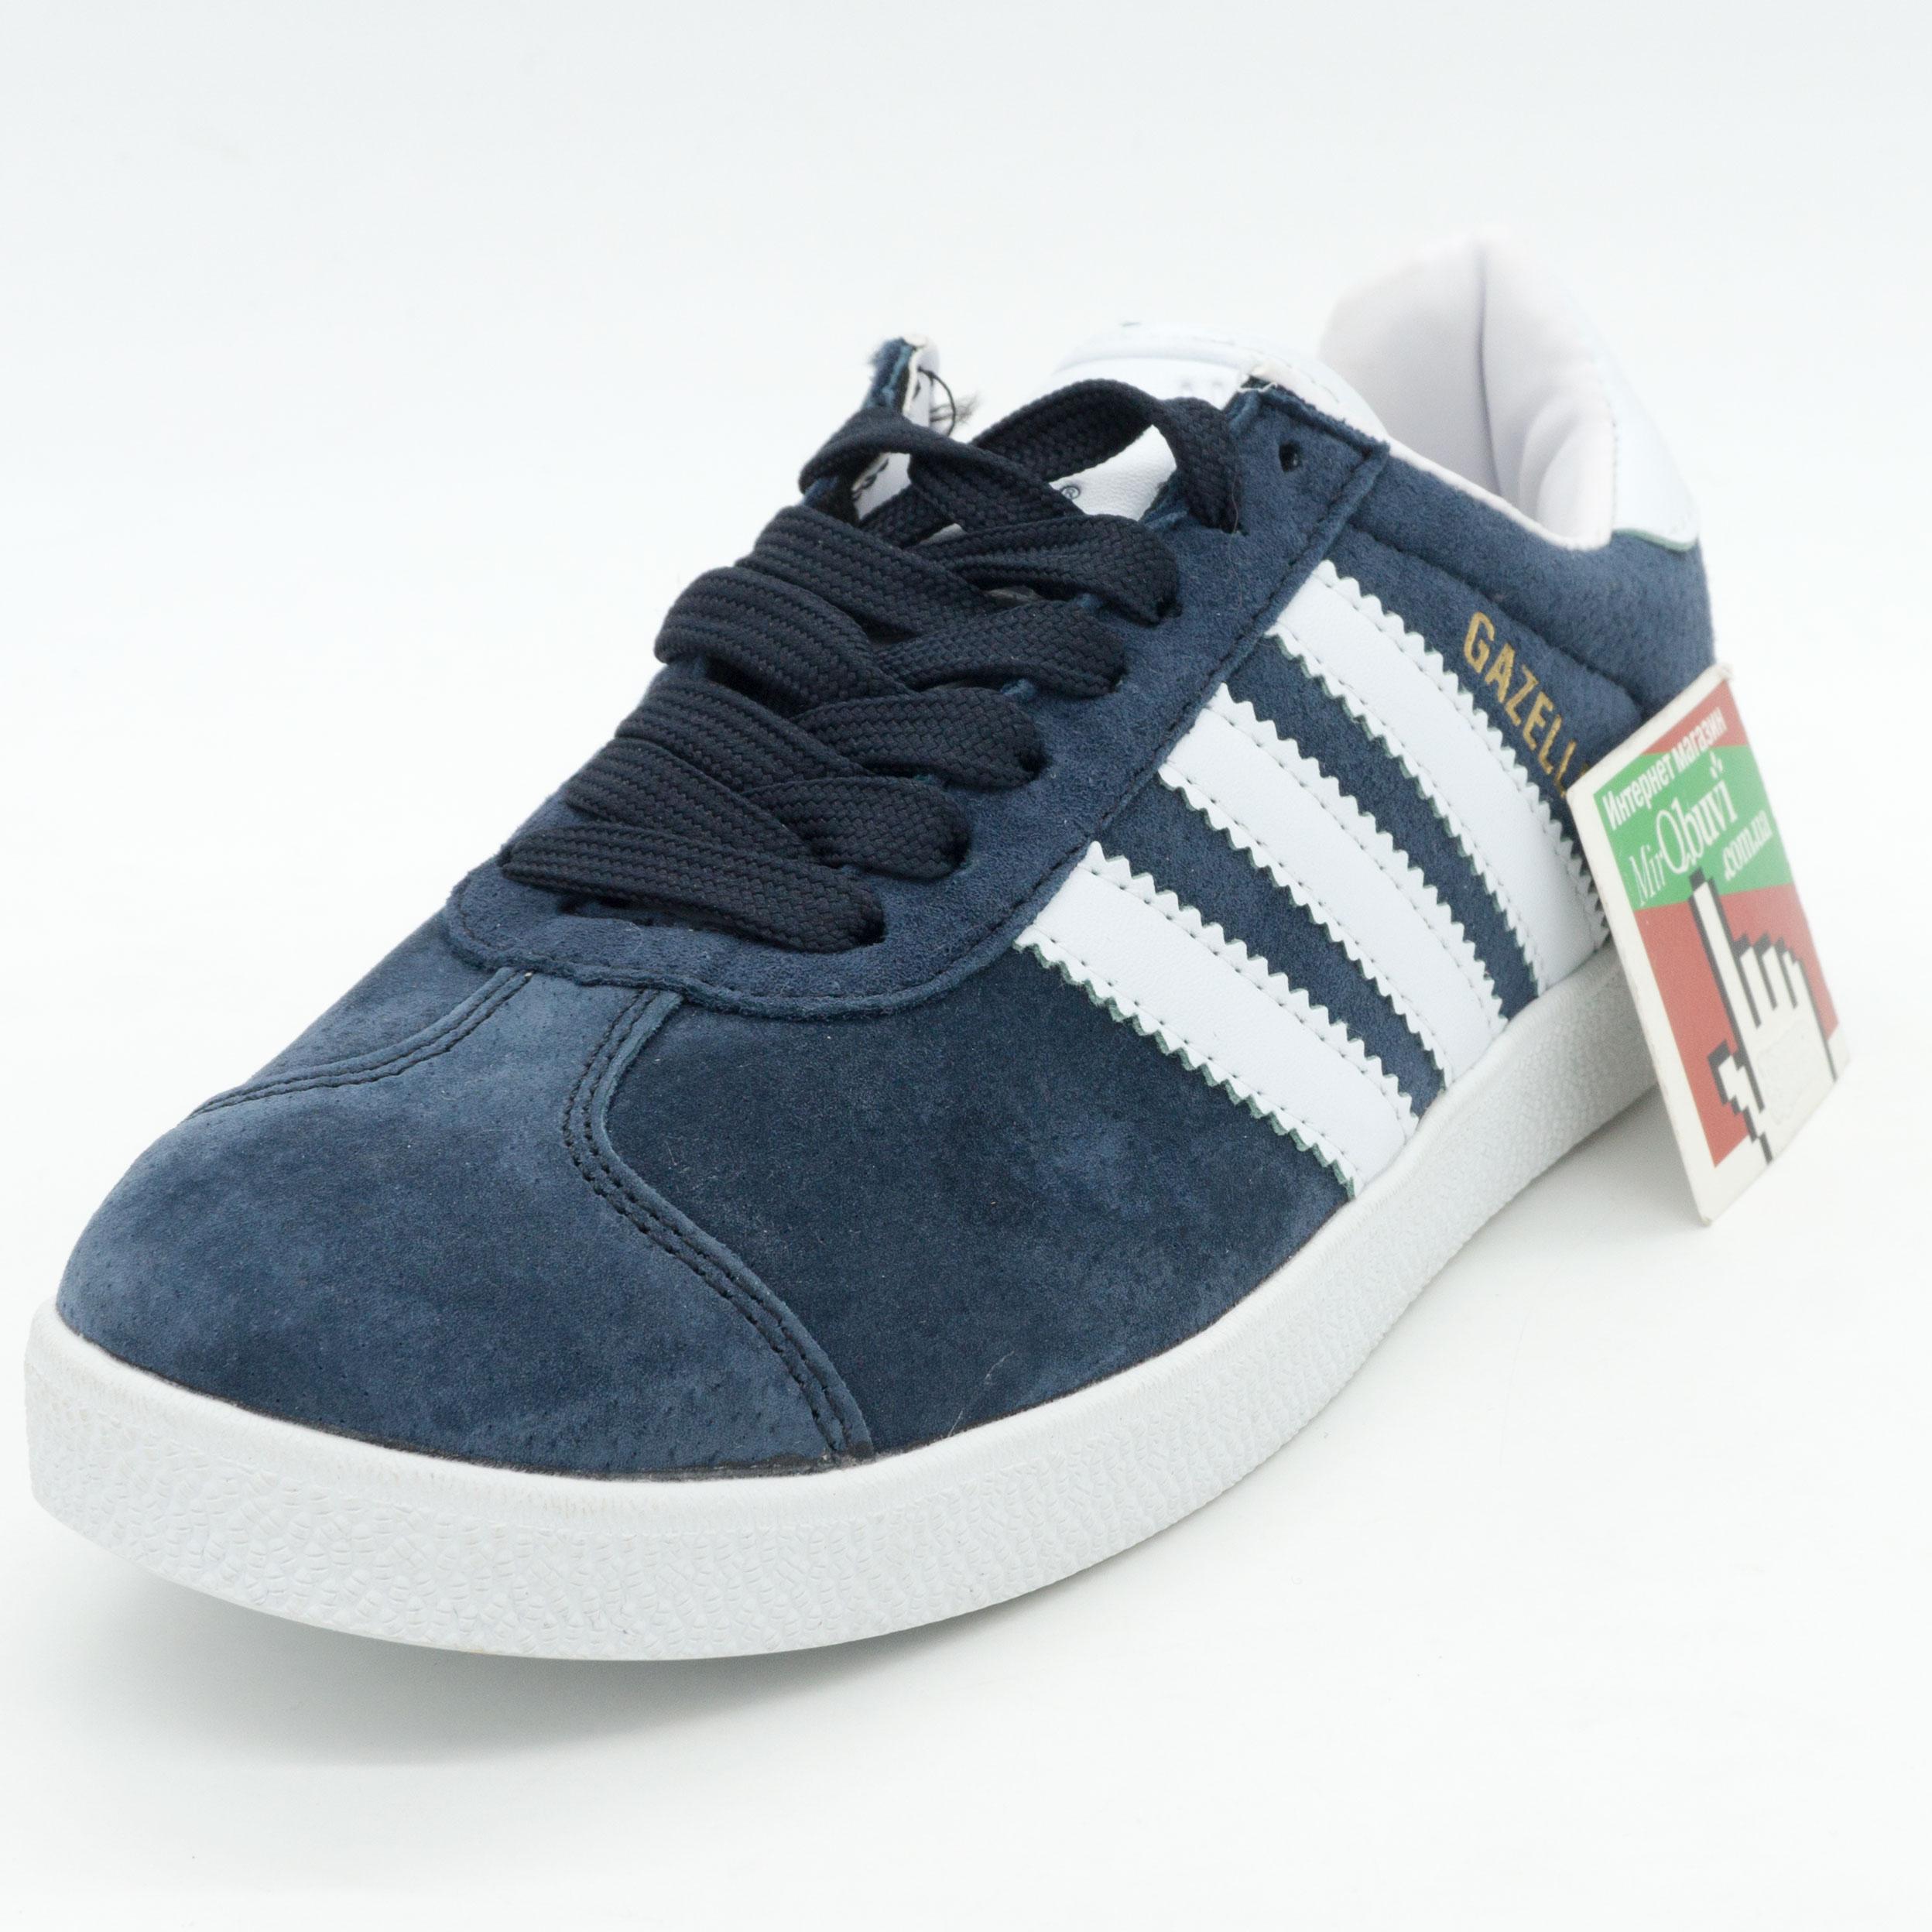 фото front Синие кроссовки Adidas Gazelle нтуральная замша Indonesia front